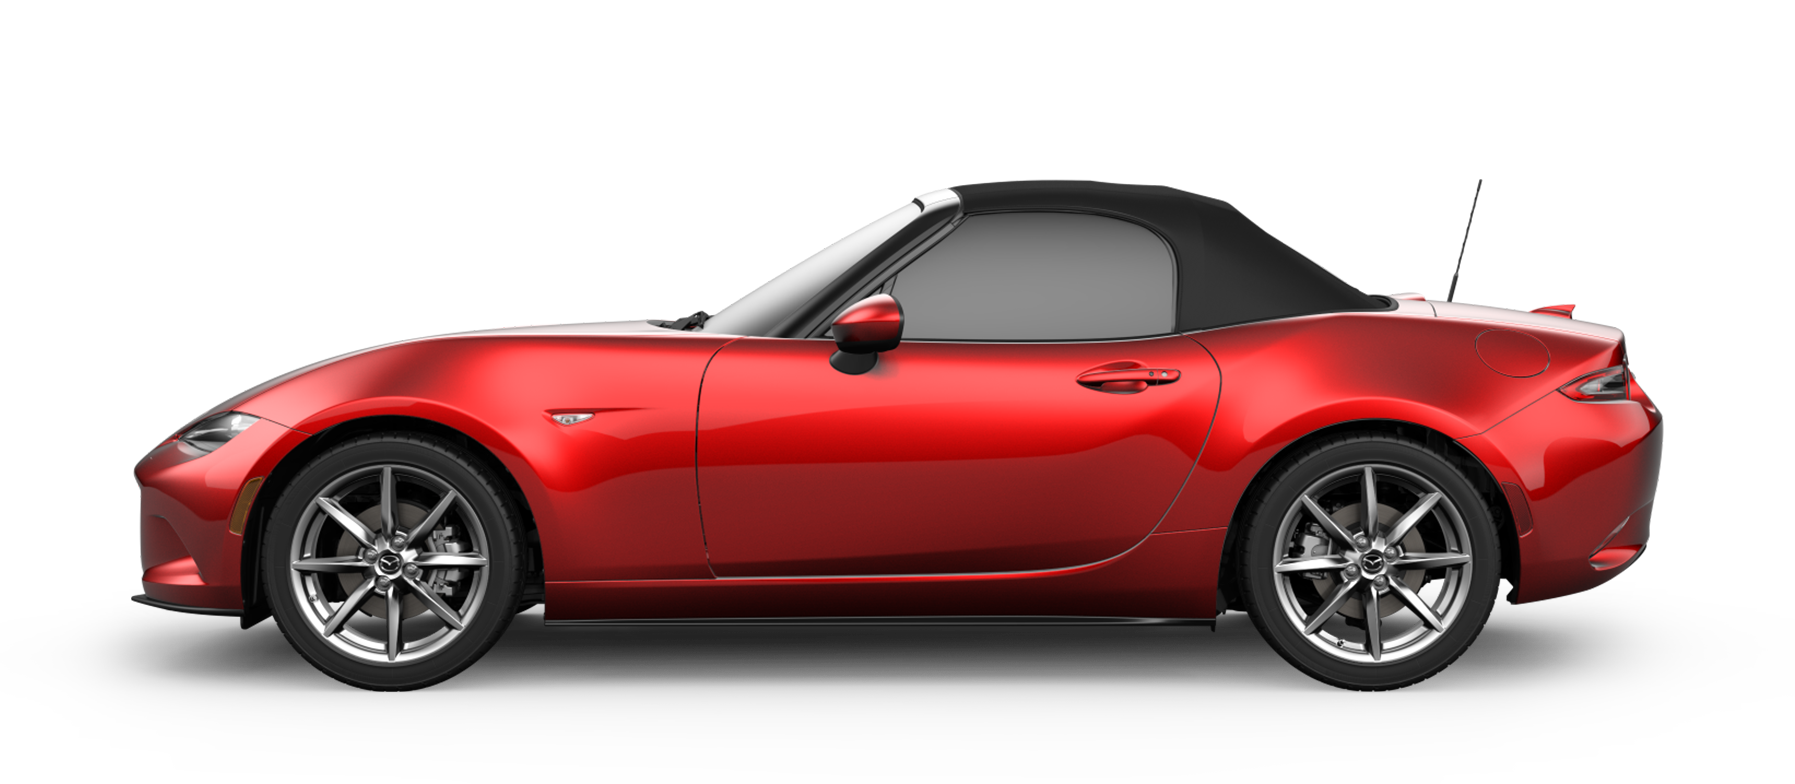 Imagen del  Mazda MX-5 Miata2019